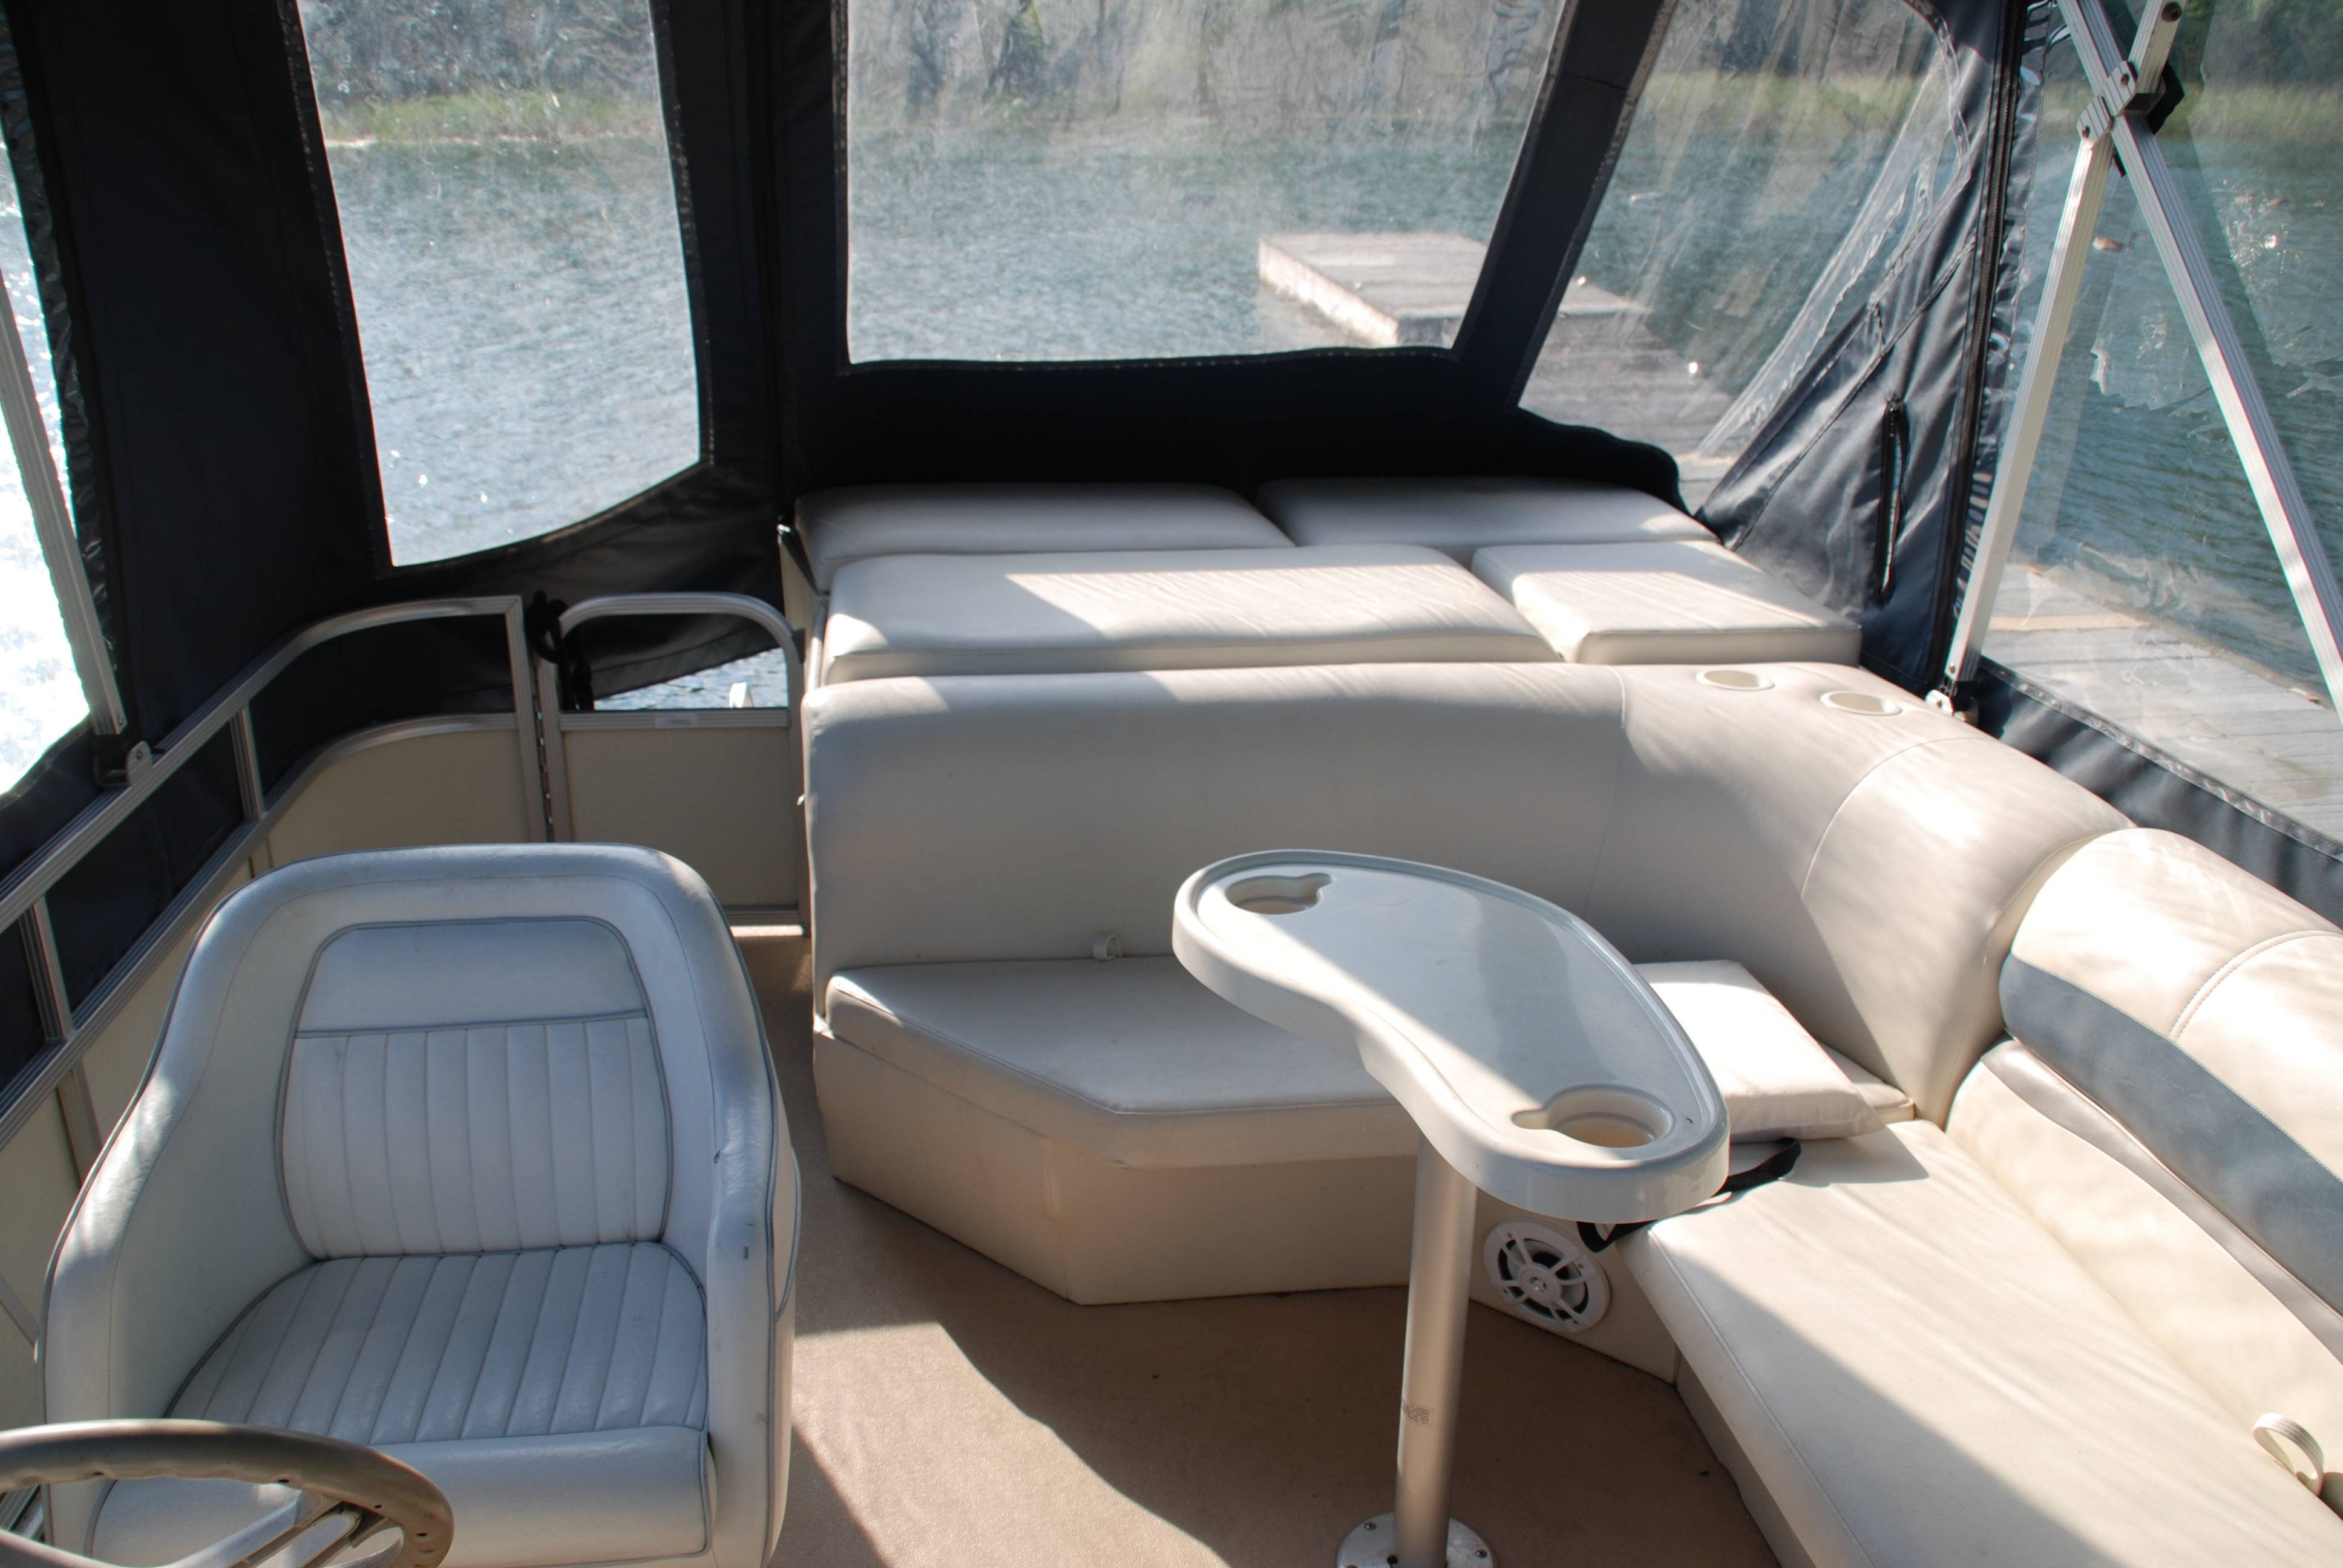 Inside view of Pontoon seating